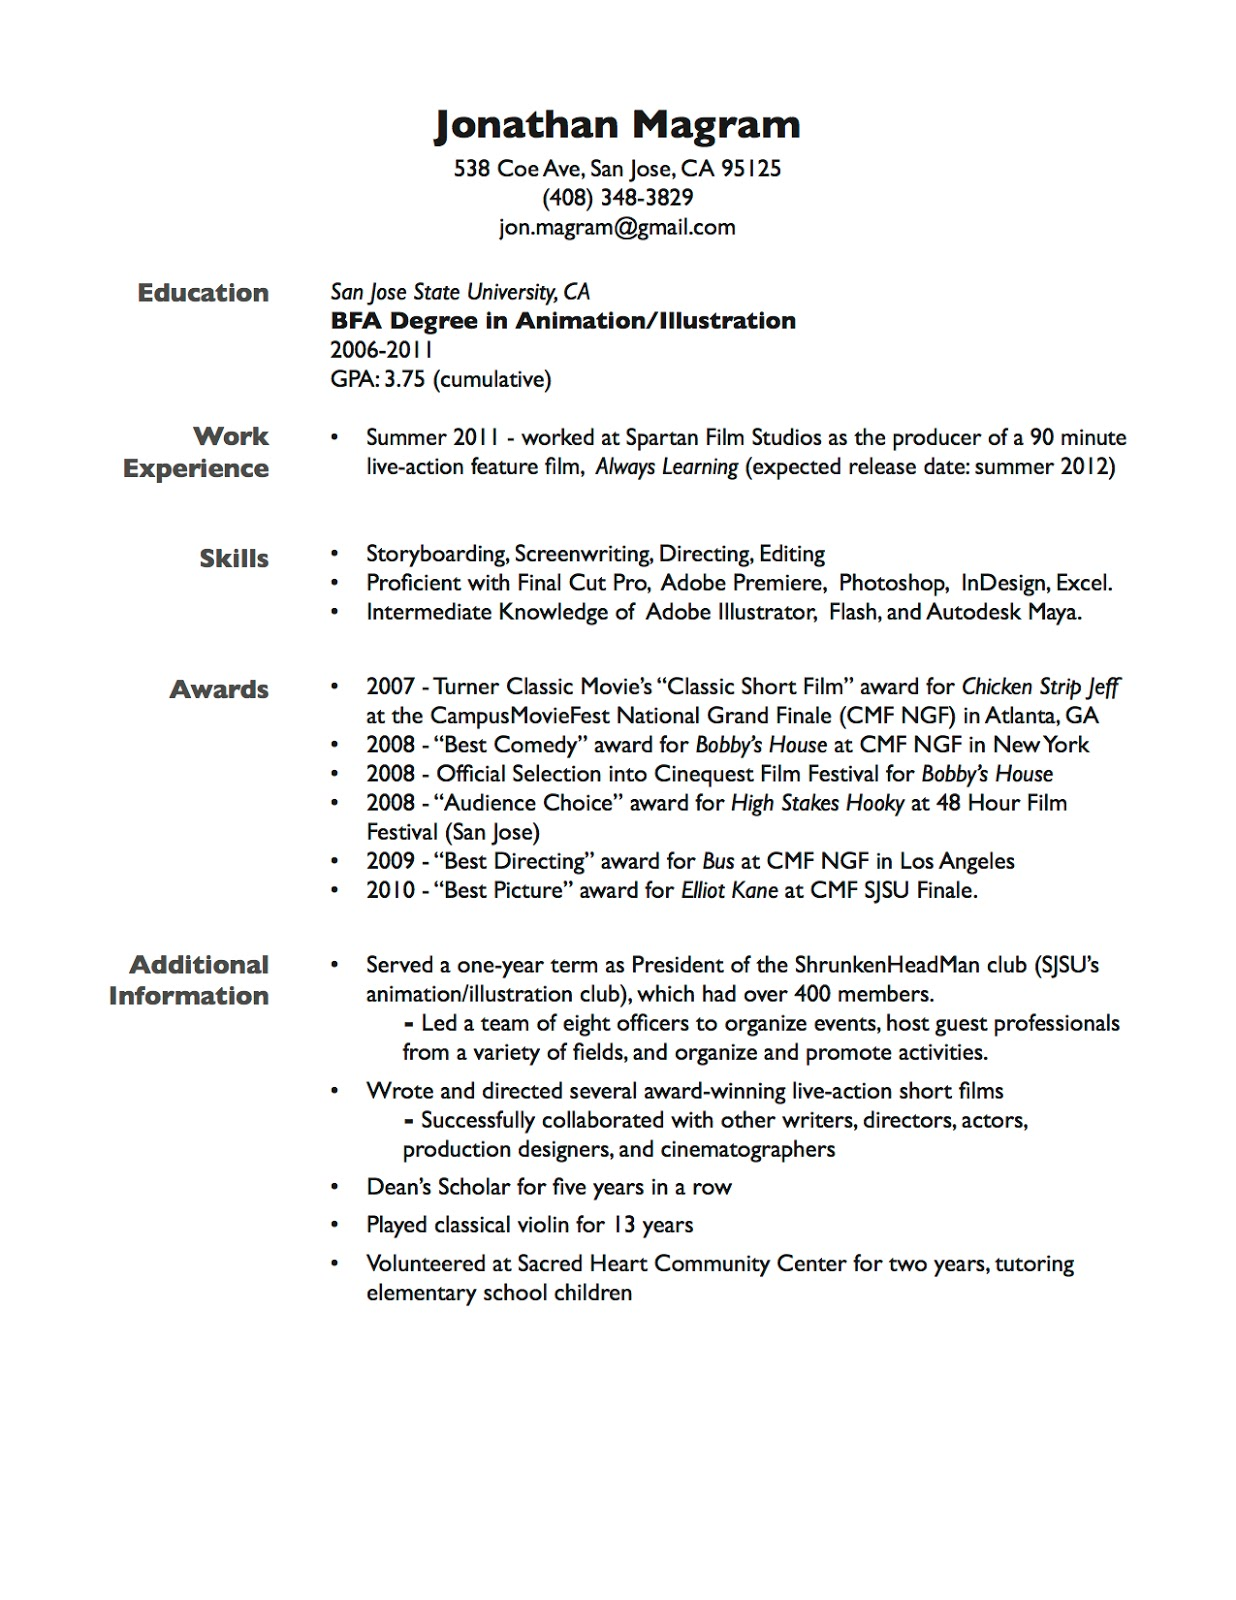 Put gpa on resume